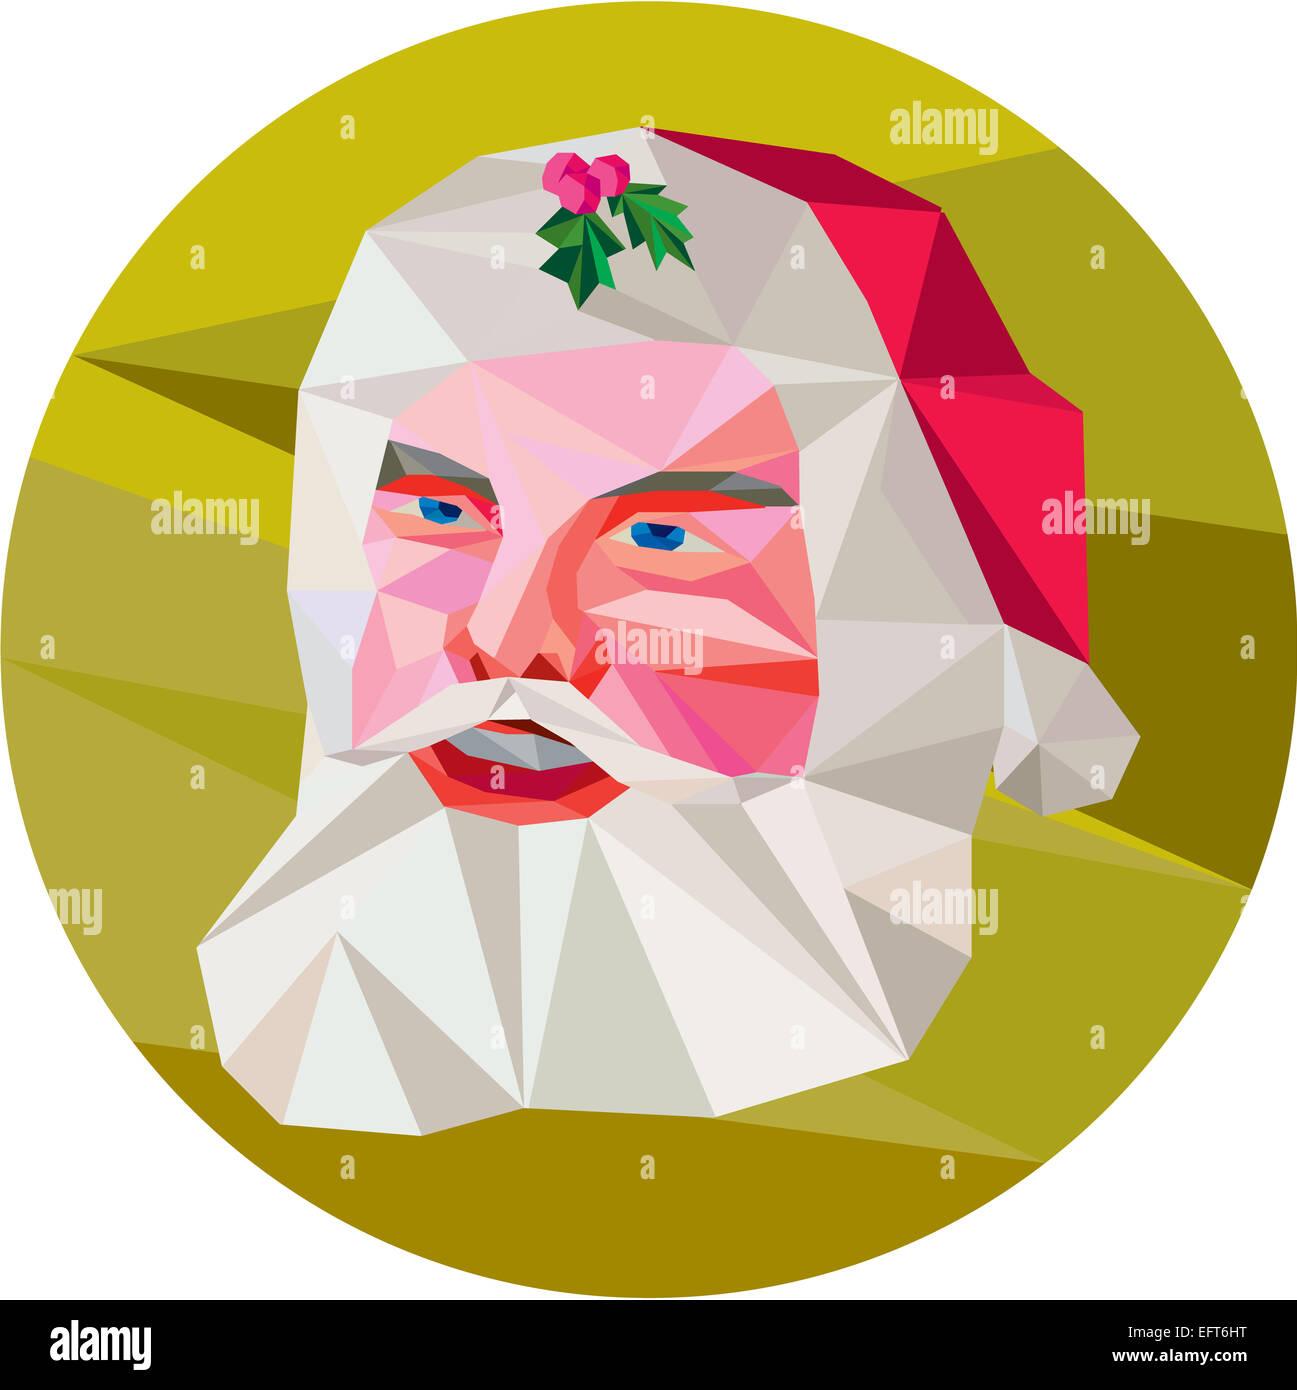 Niedrige Polygon Abbildung von Santa Claus Sankt Nikolaus Vater ...